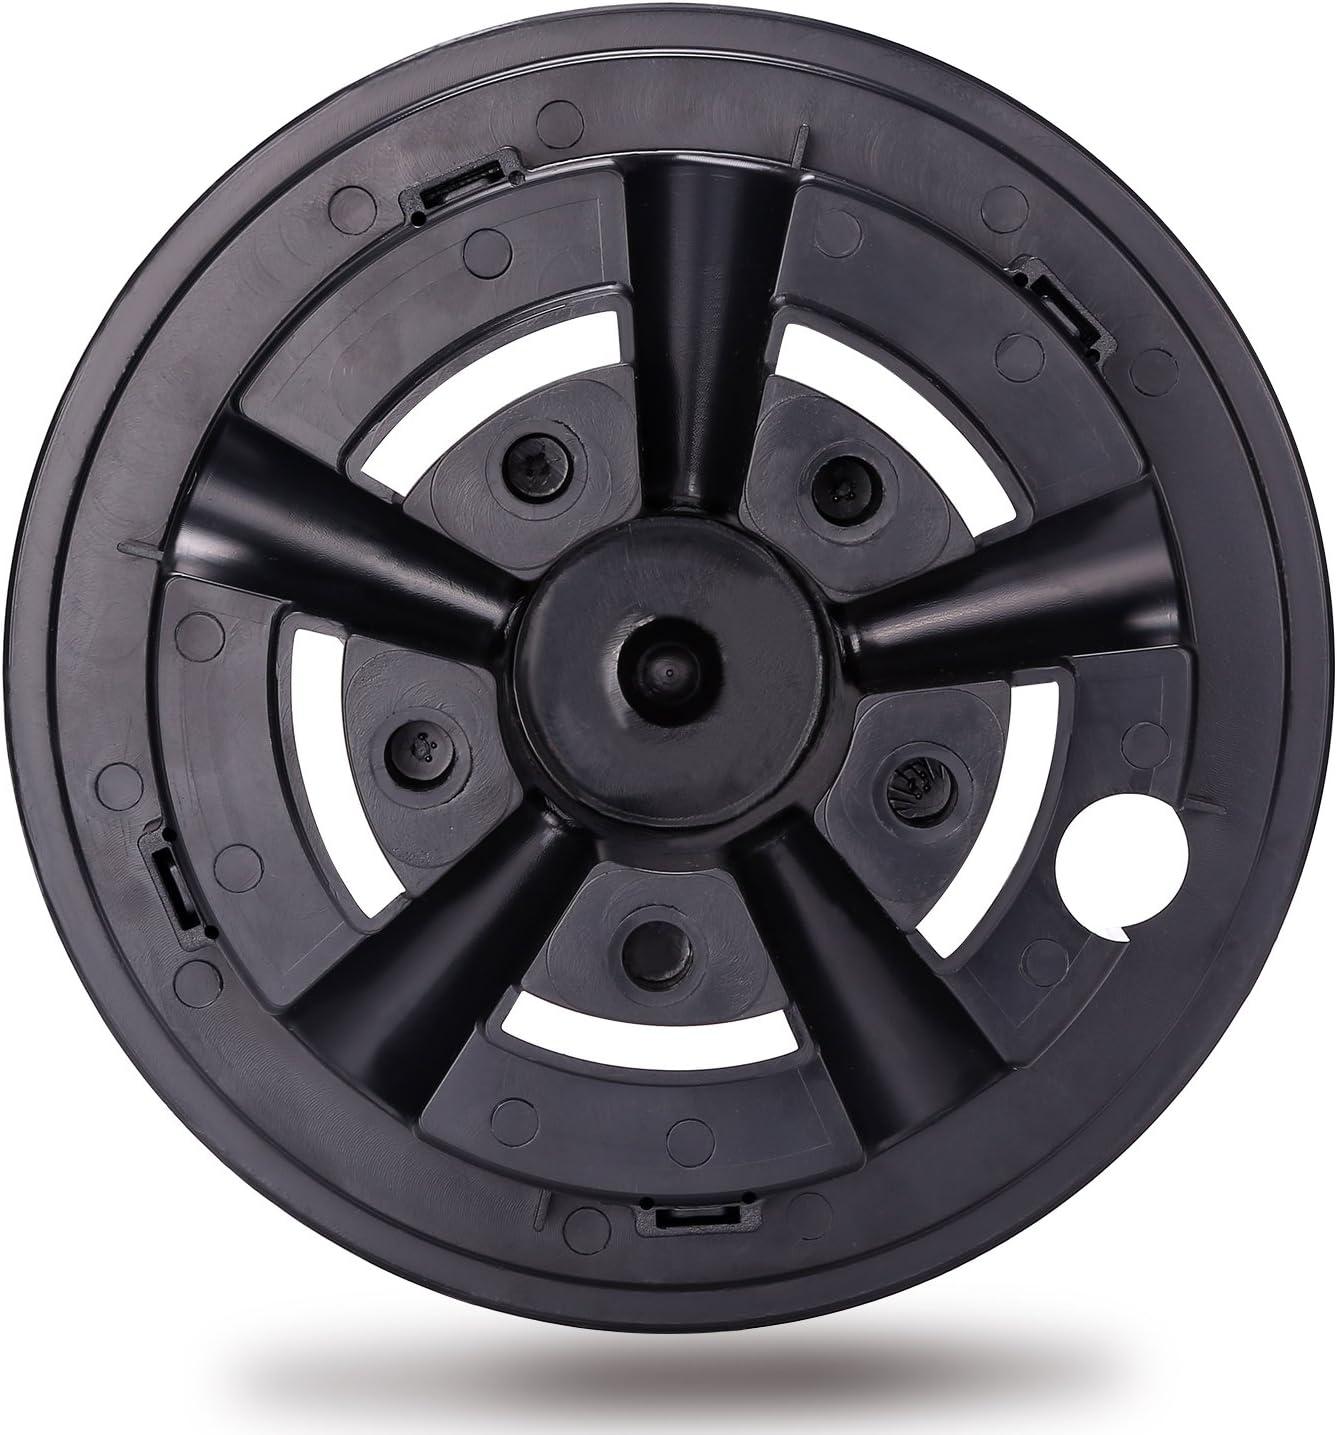 10L0L Golf Cart Wheel Covers Hub Caps for Yamaha/Club CAR/EZ-GO Par Car 8